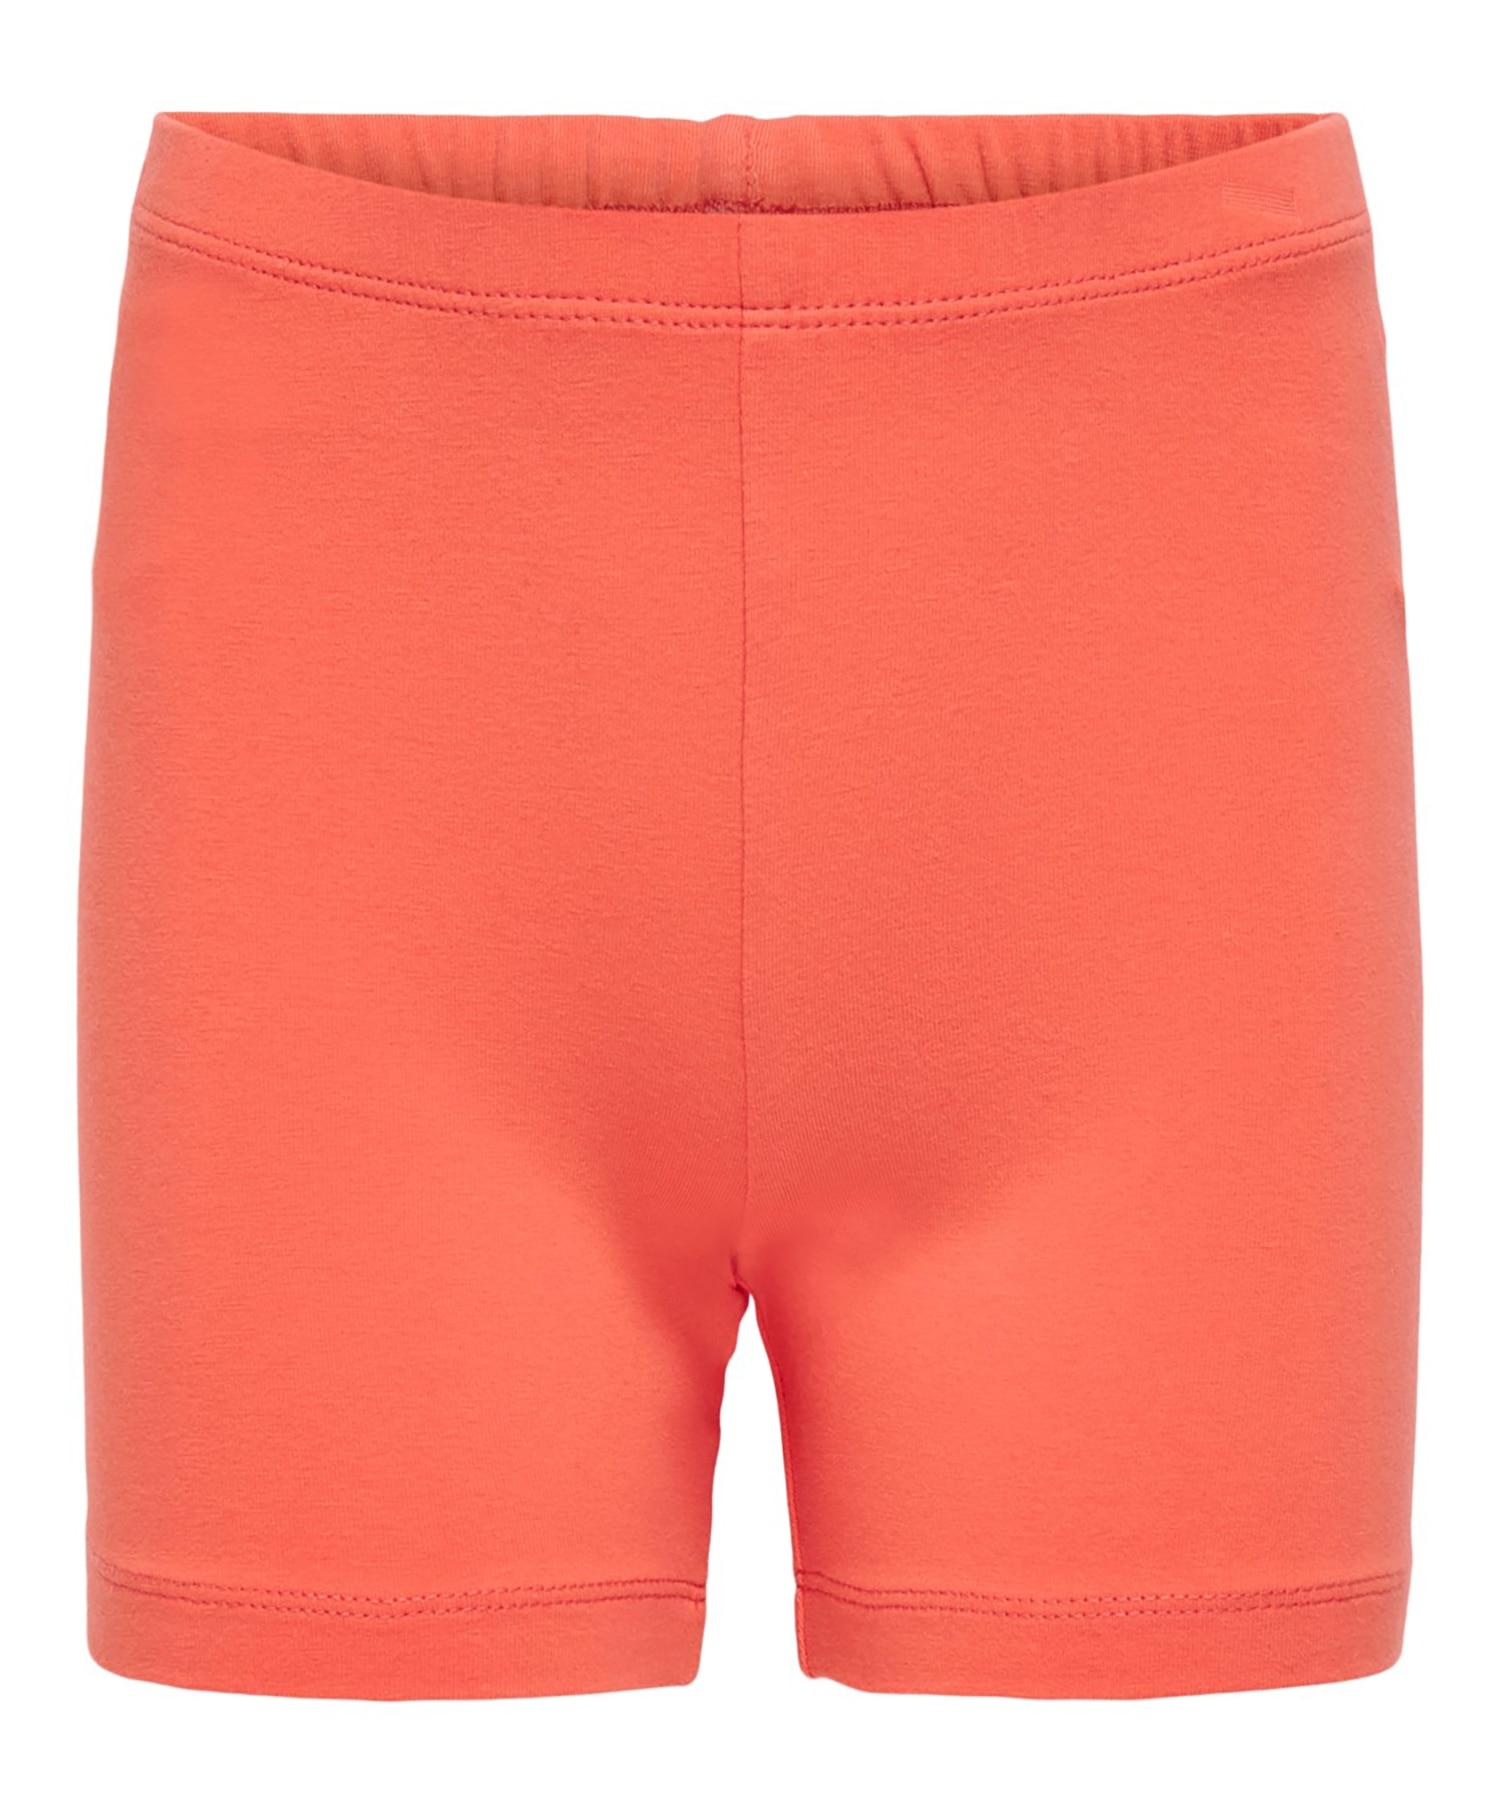 Only Kids city shorts